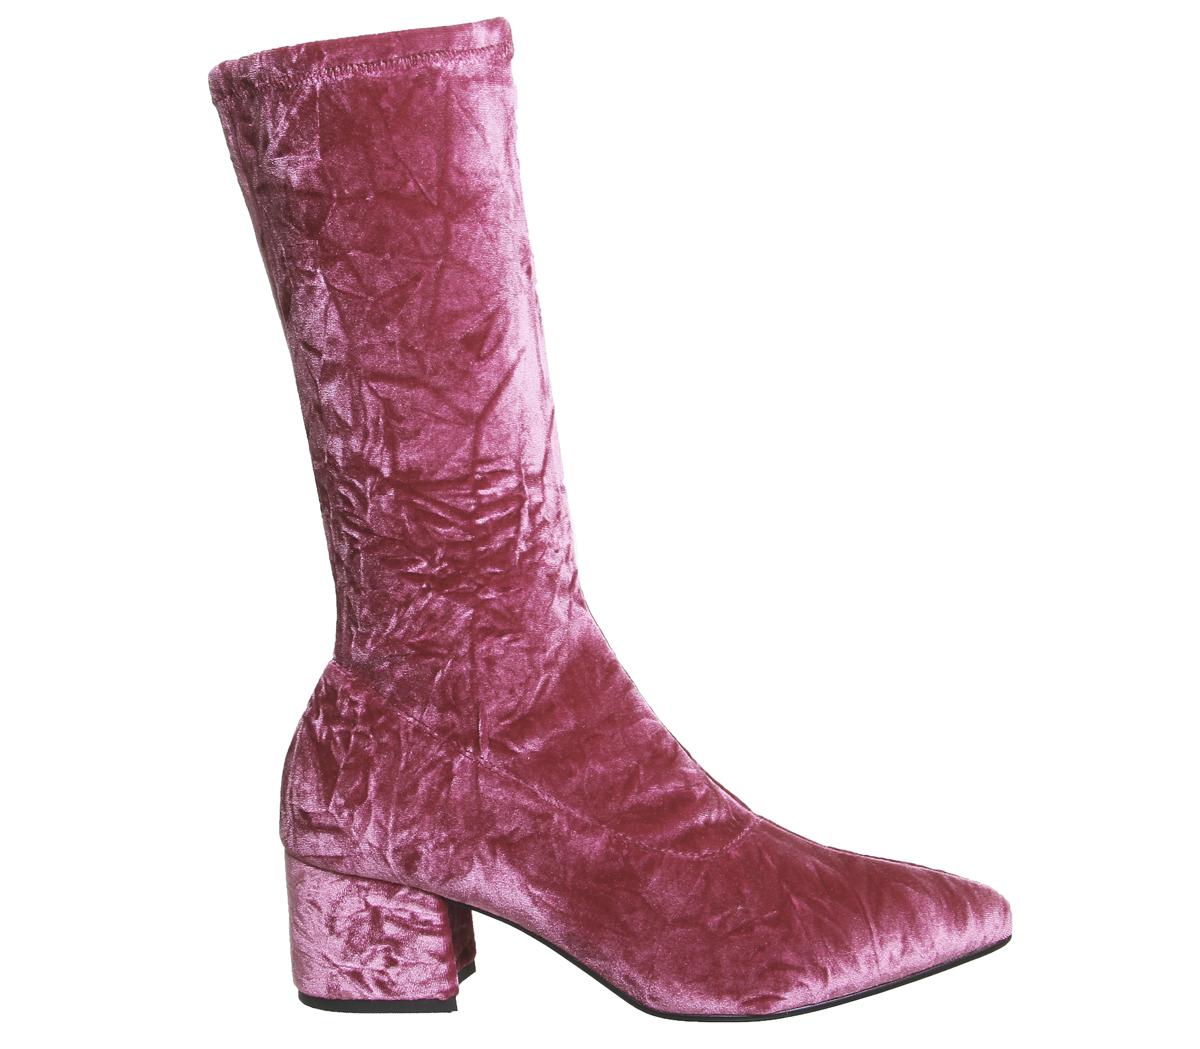 d3f40f1eacab Sentinel Womens Vagabond Mya Tall Boots Pink Velvet Boots. Sentinel  Thumbnail 3